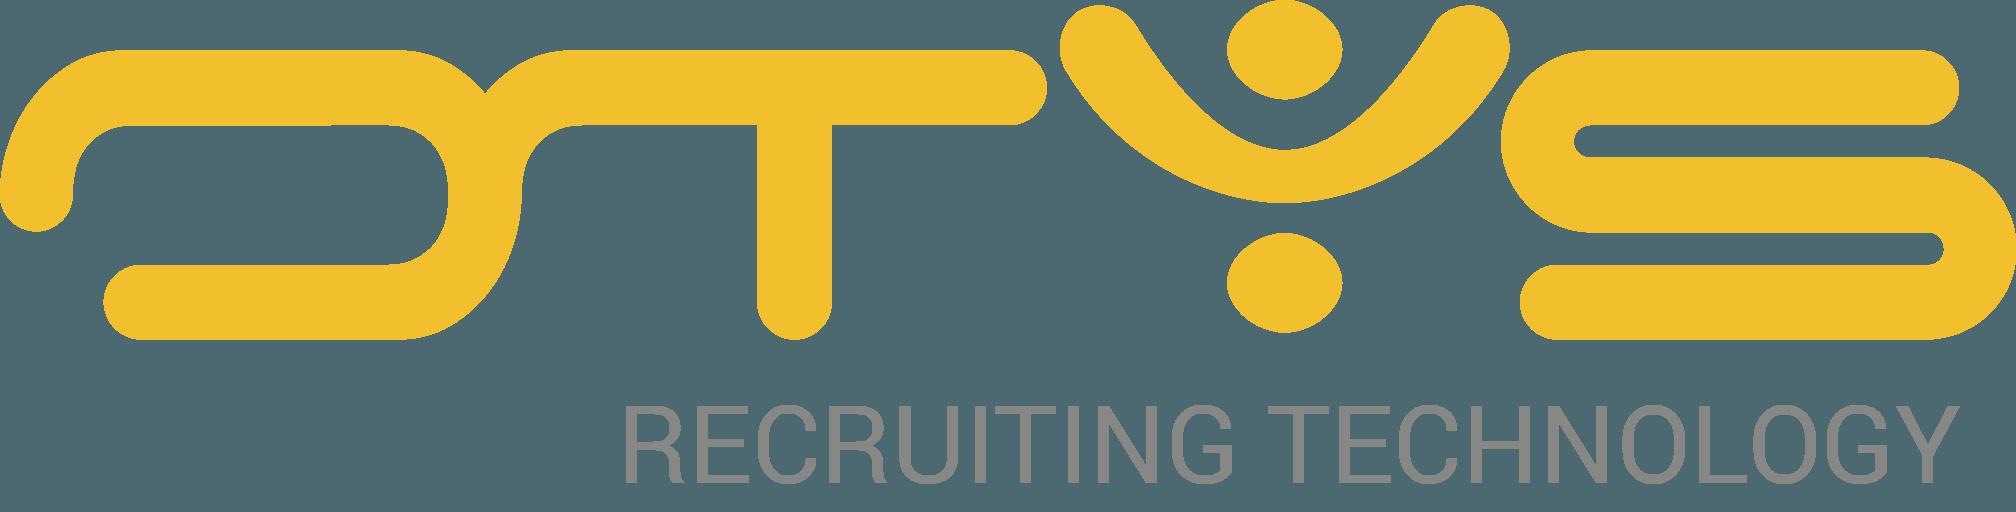 otys recruiting - klant van vertaalbureau euro-com